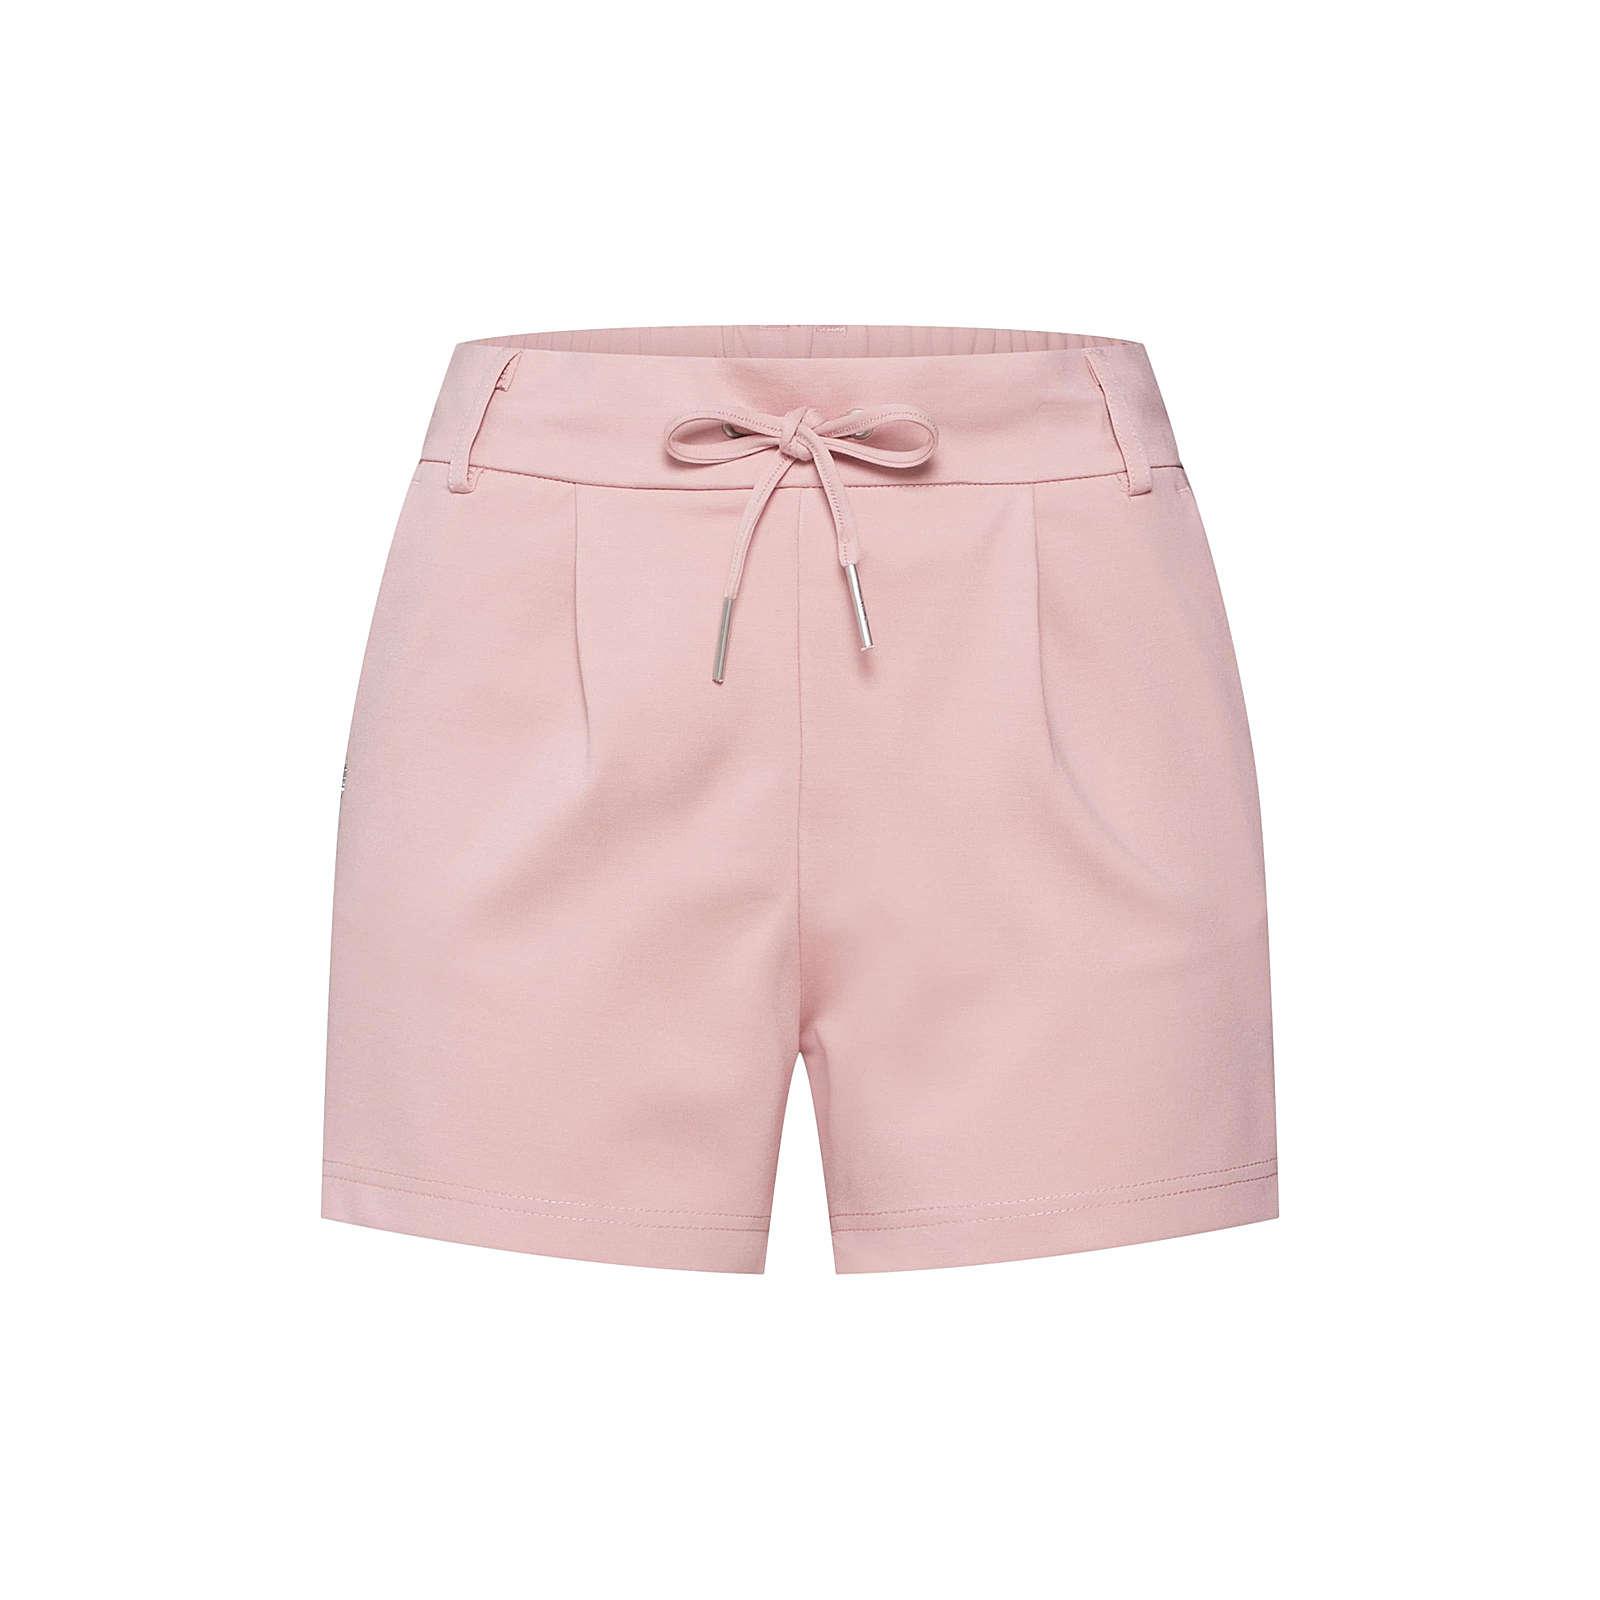 ONLY Bundfaltenhose Anzughosen rosa Damen Gr. 44